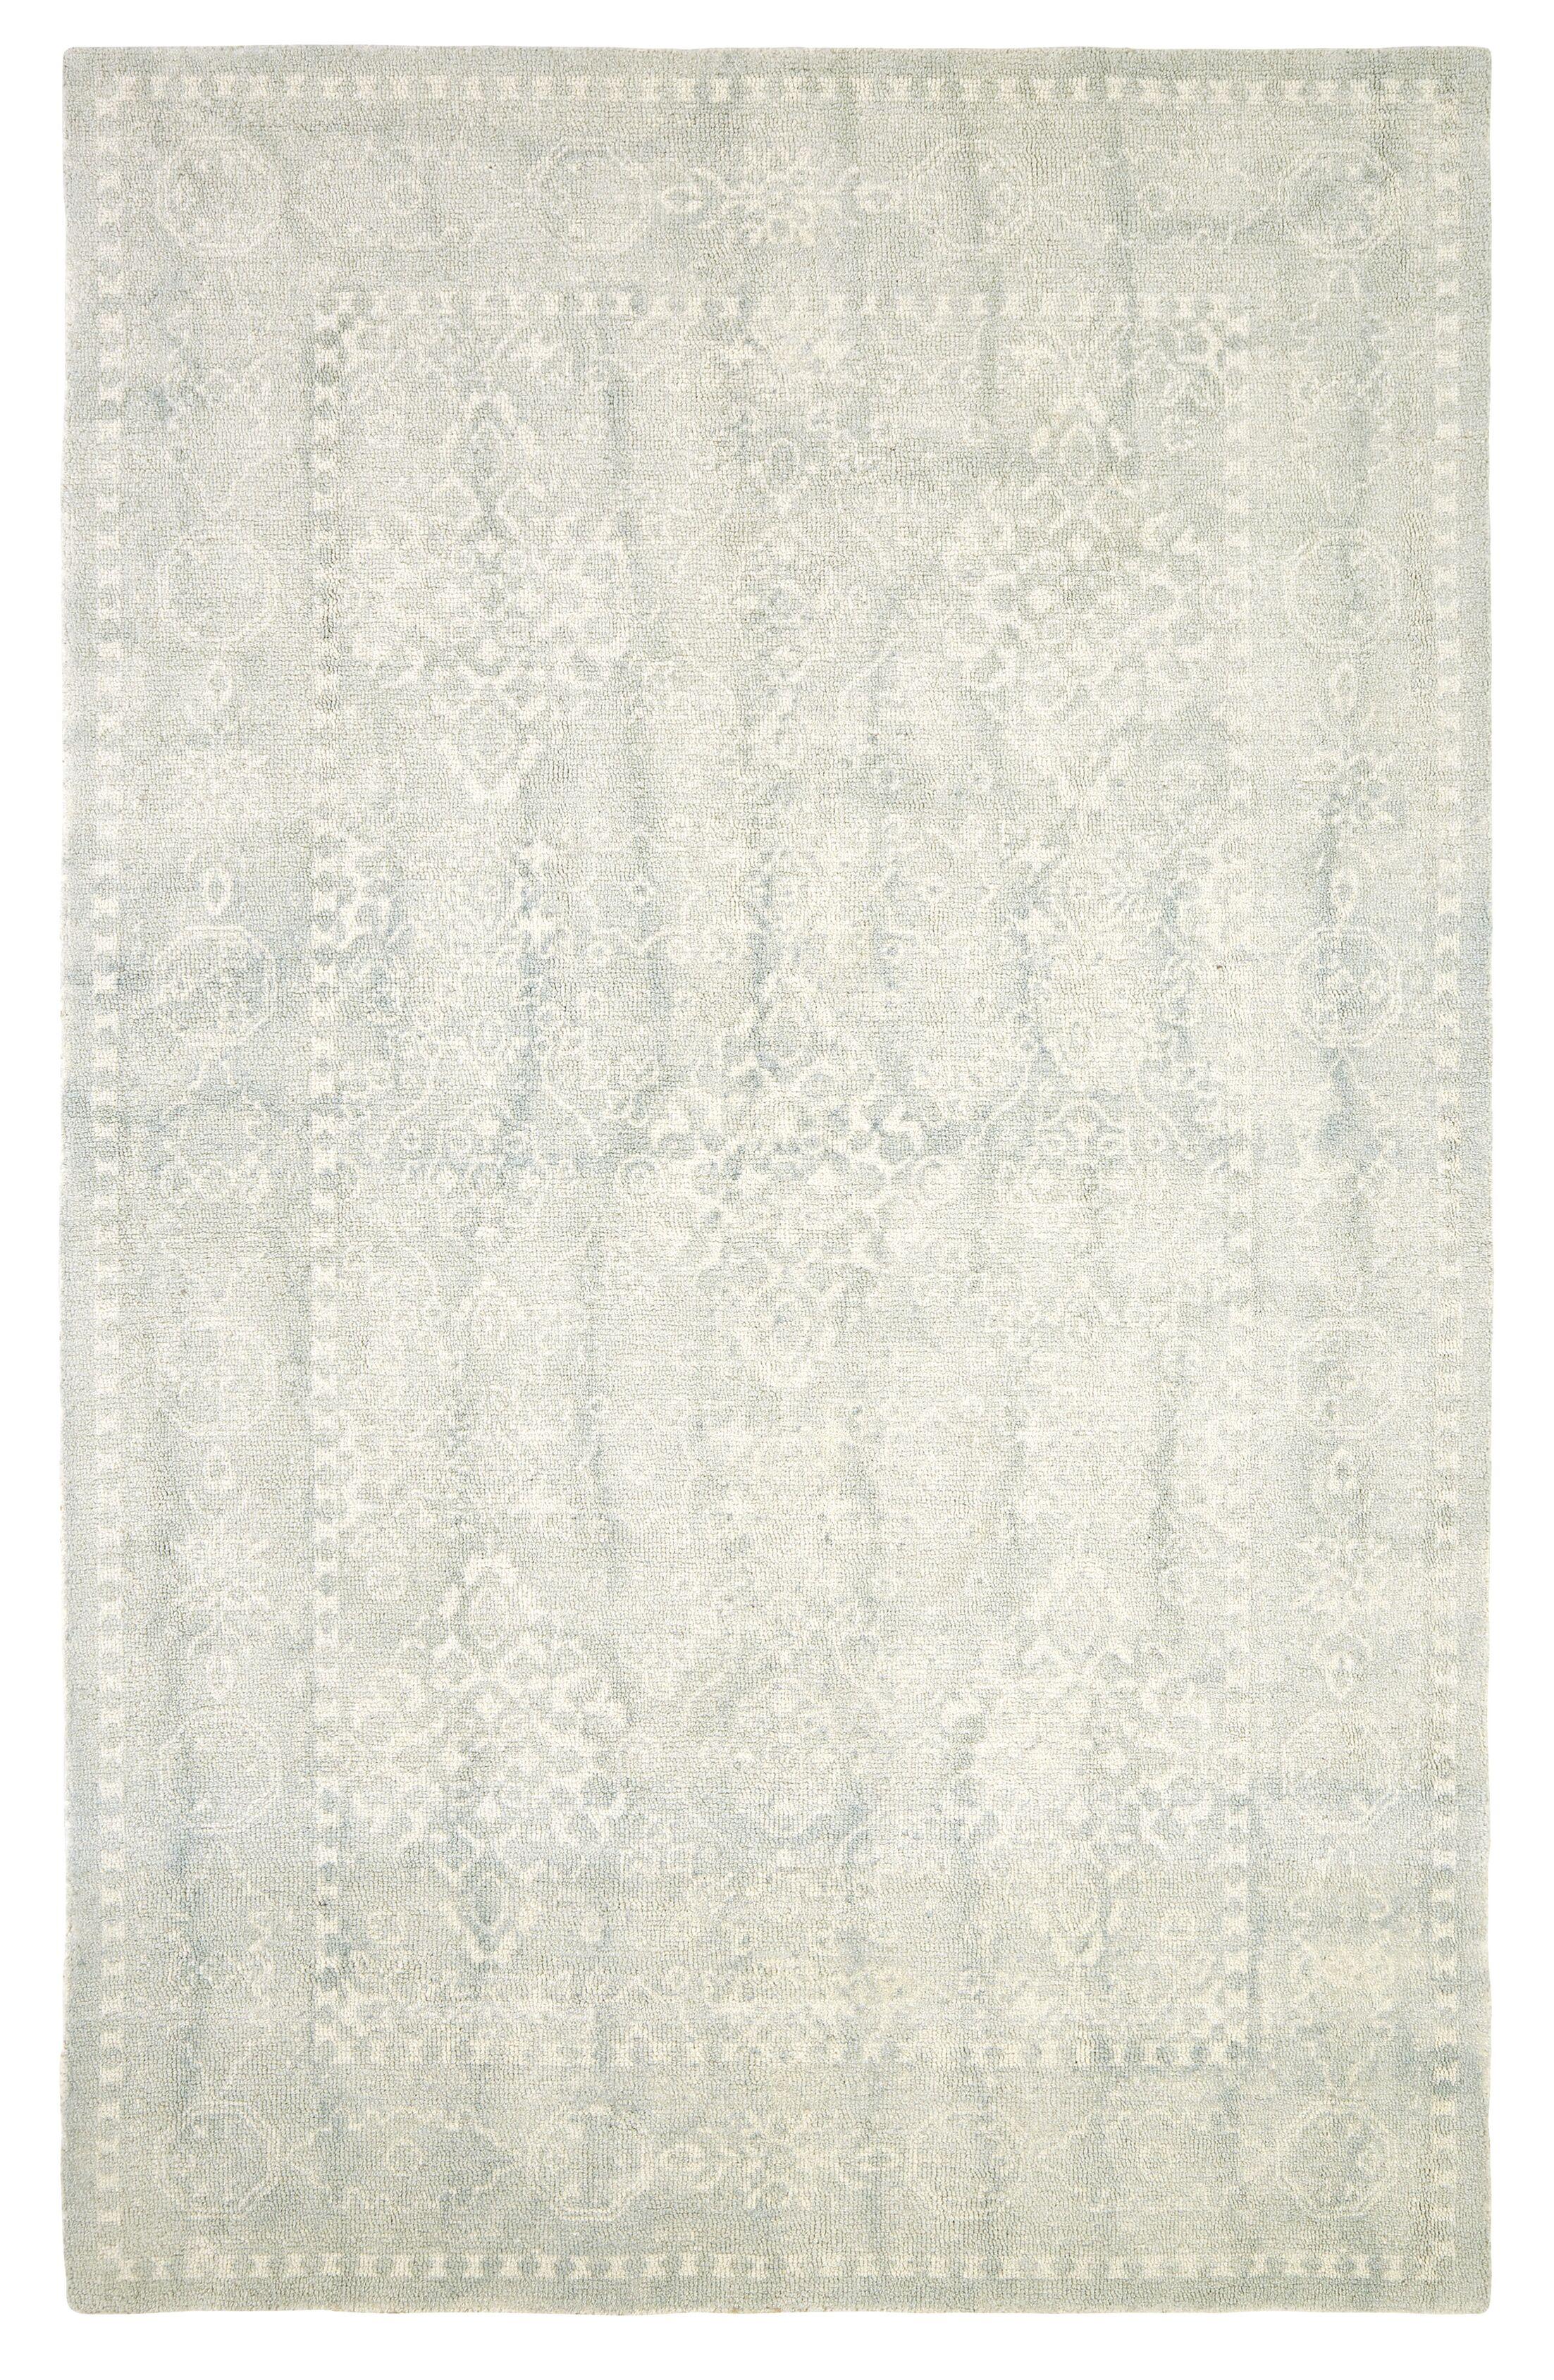 Anamaria Hand-Tufted Light Blue Area Rug Rug Size: Rectangle 5' x 8'